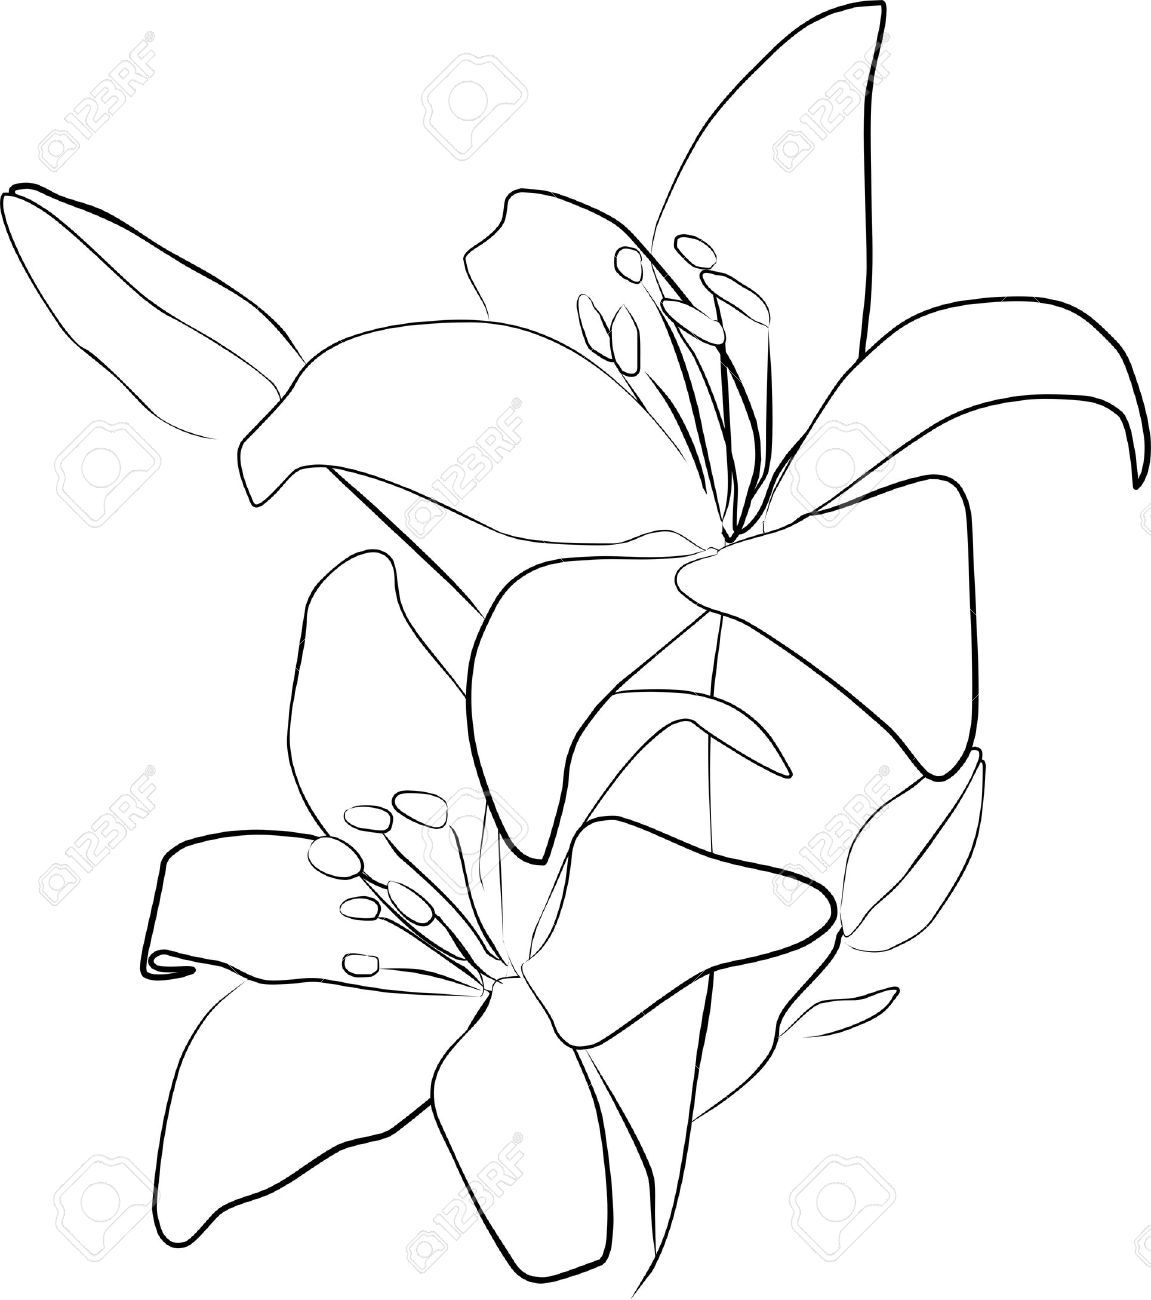 dead lily flower Google Search ΟΞΩ Pinterest